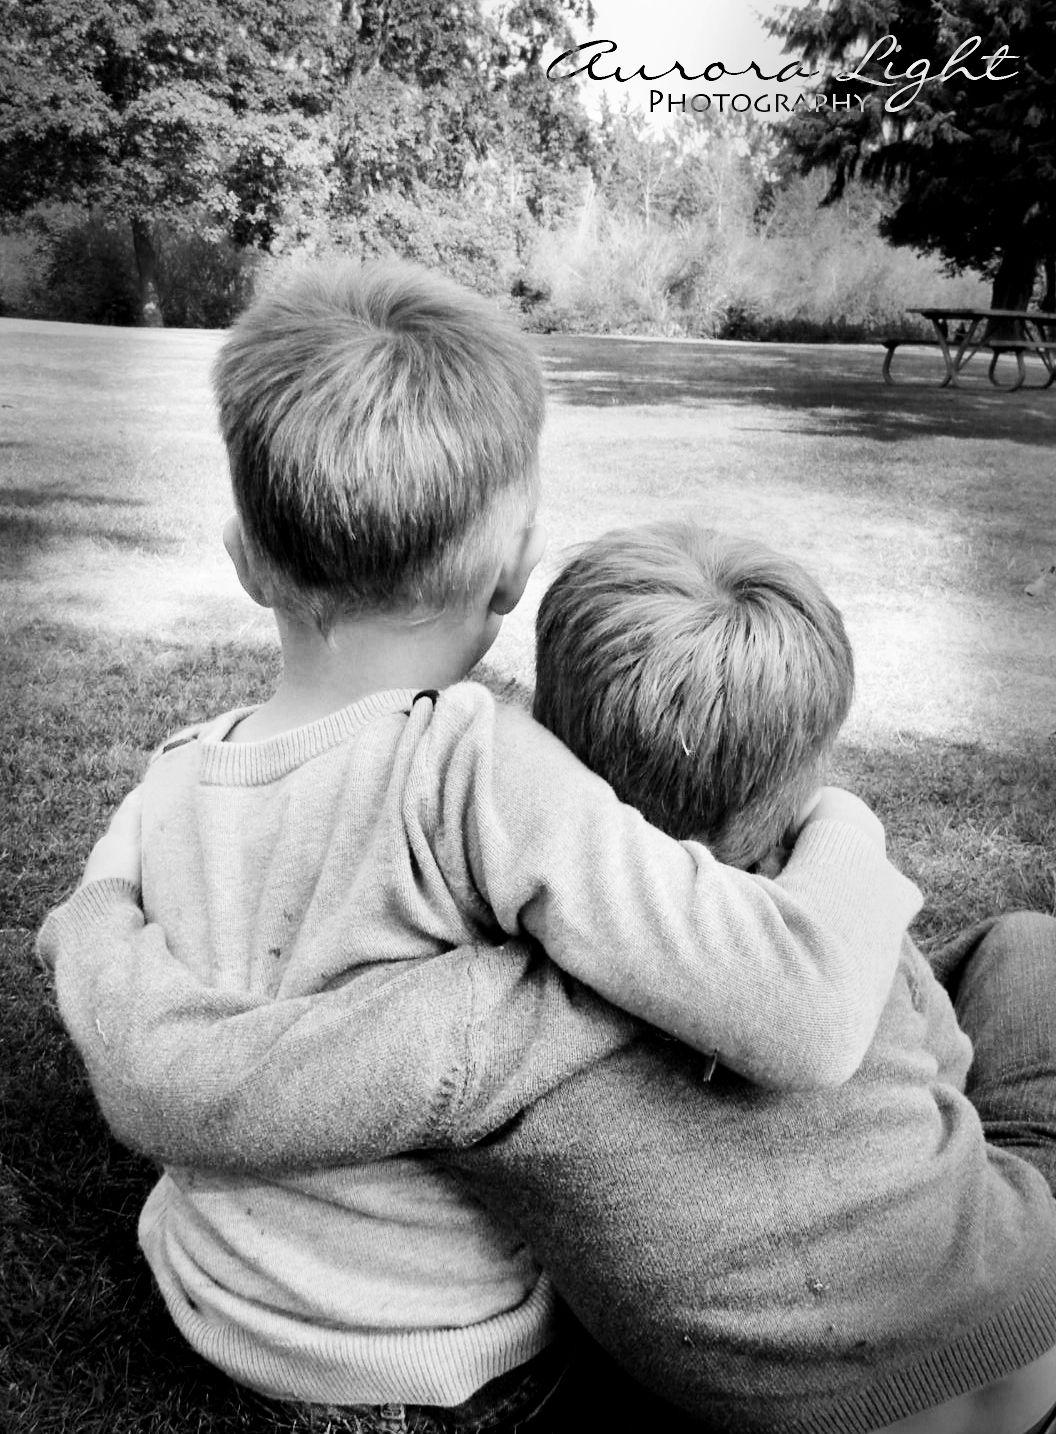 Brothers, Boys, Family Photos, Fun Idea to do at the Park ...